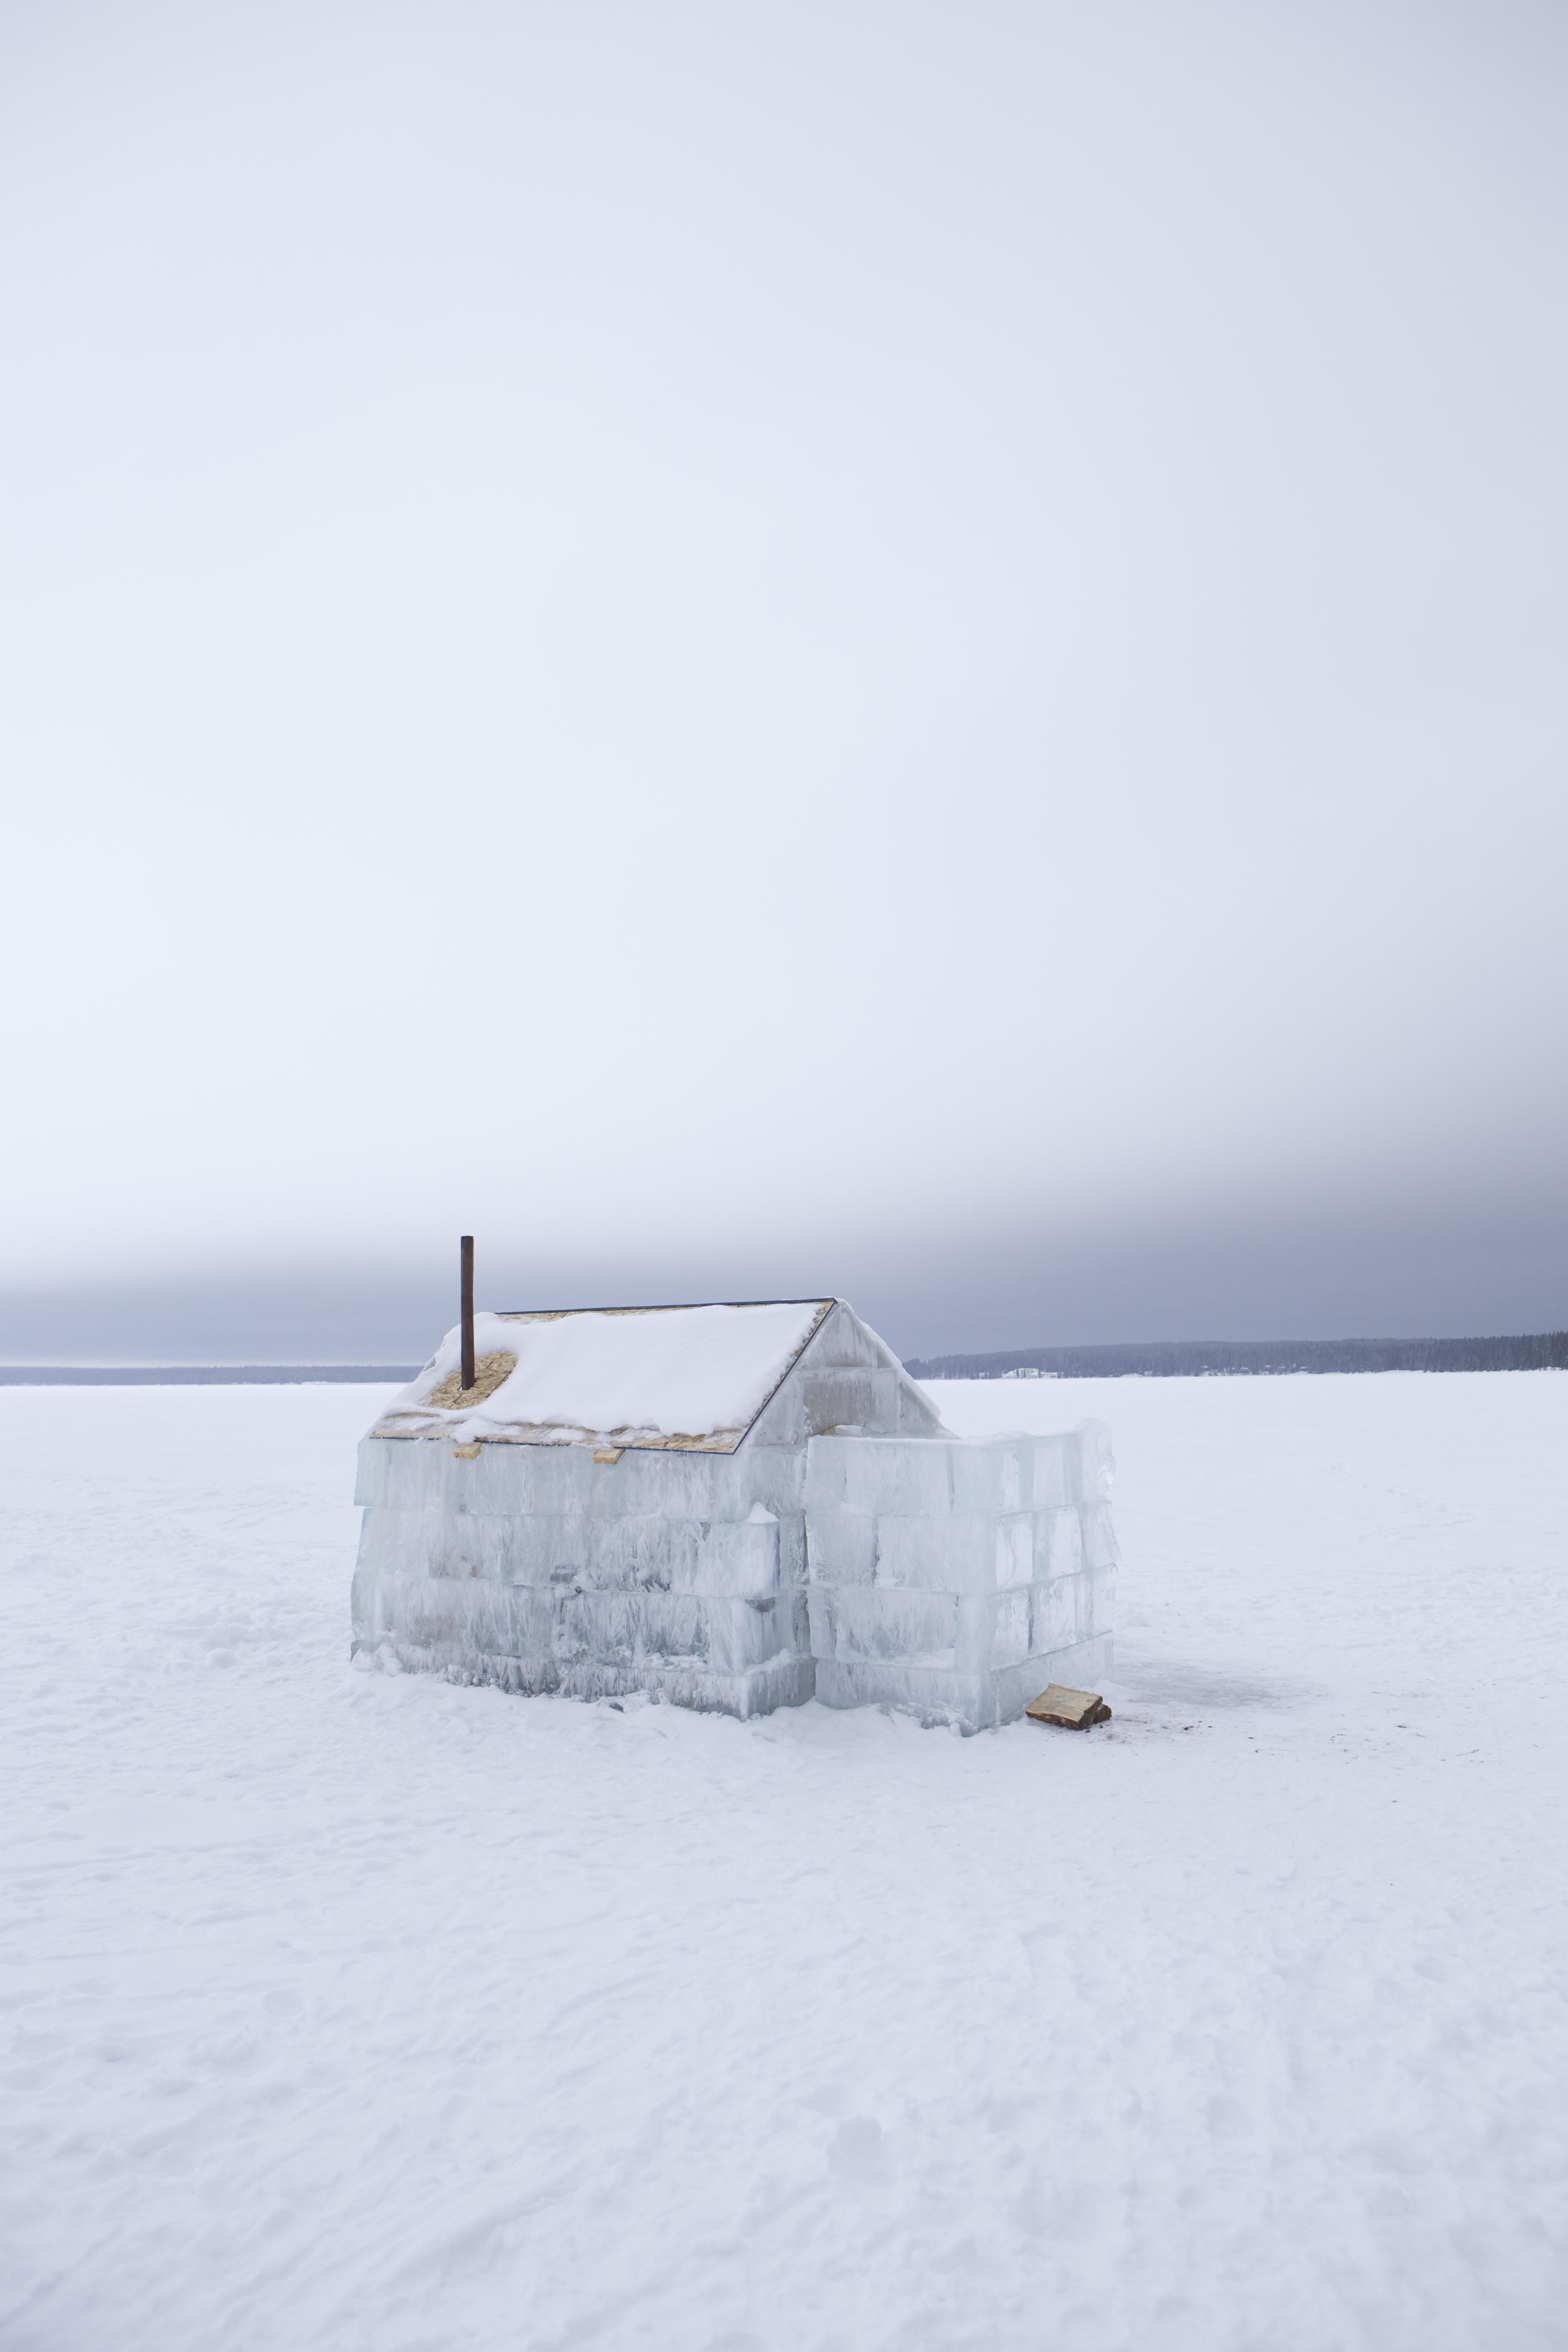 Ice Cabin in Waskesui, Saskatchewan.